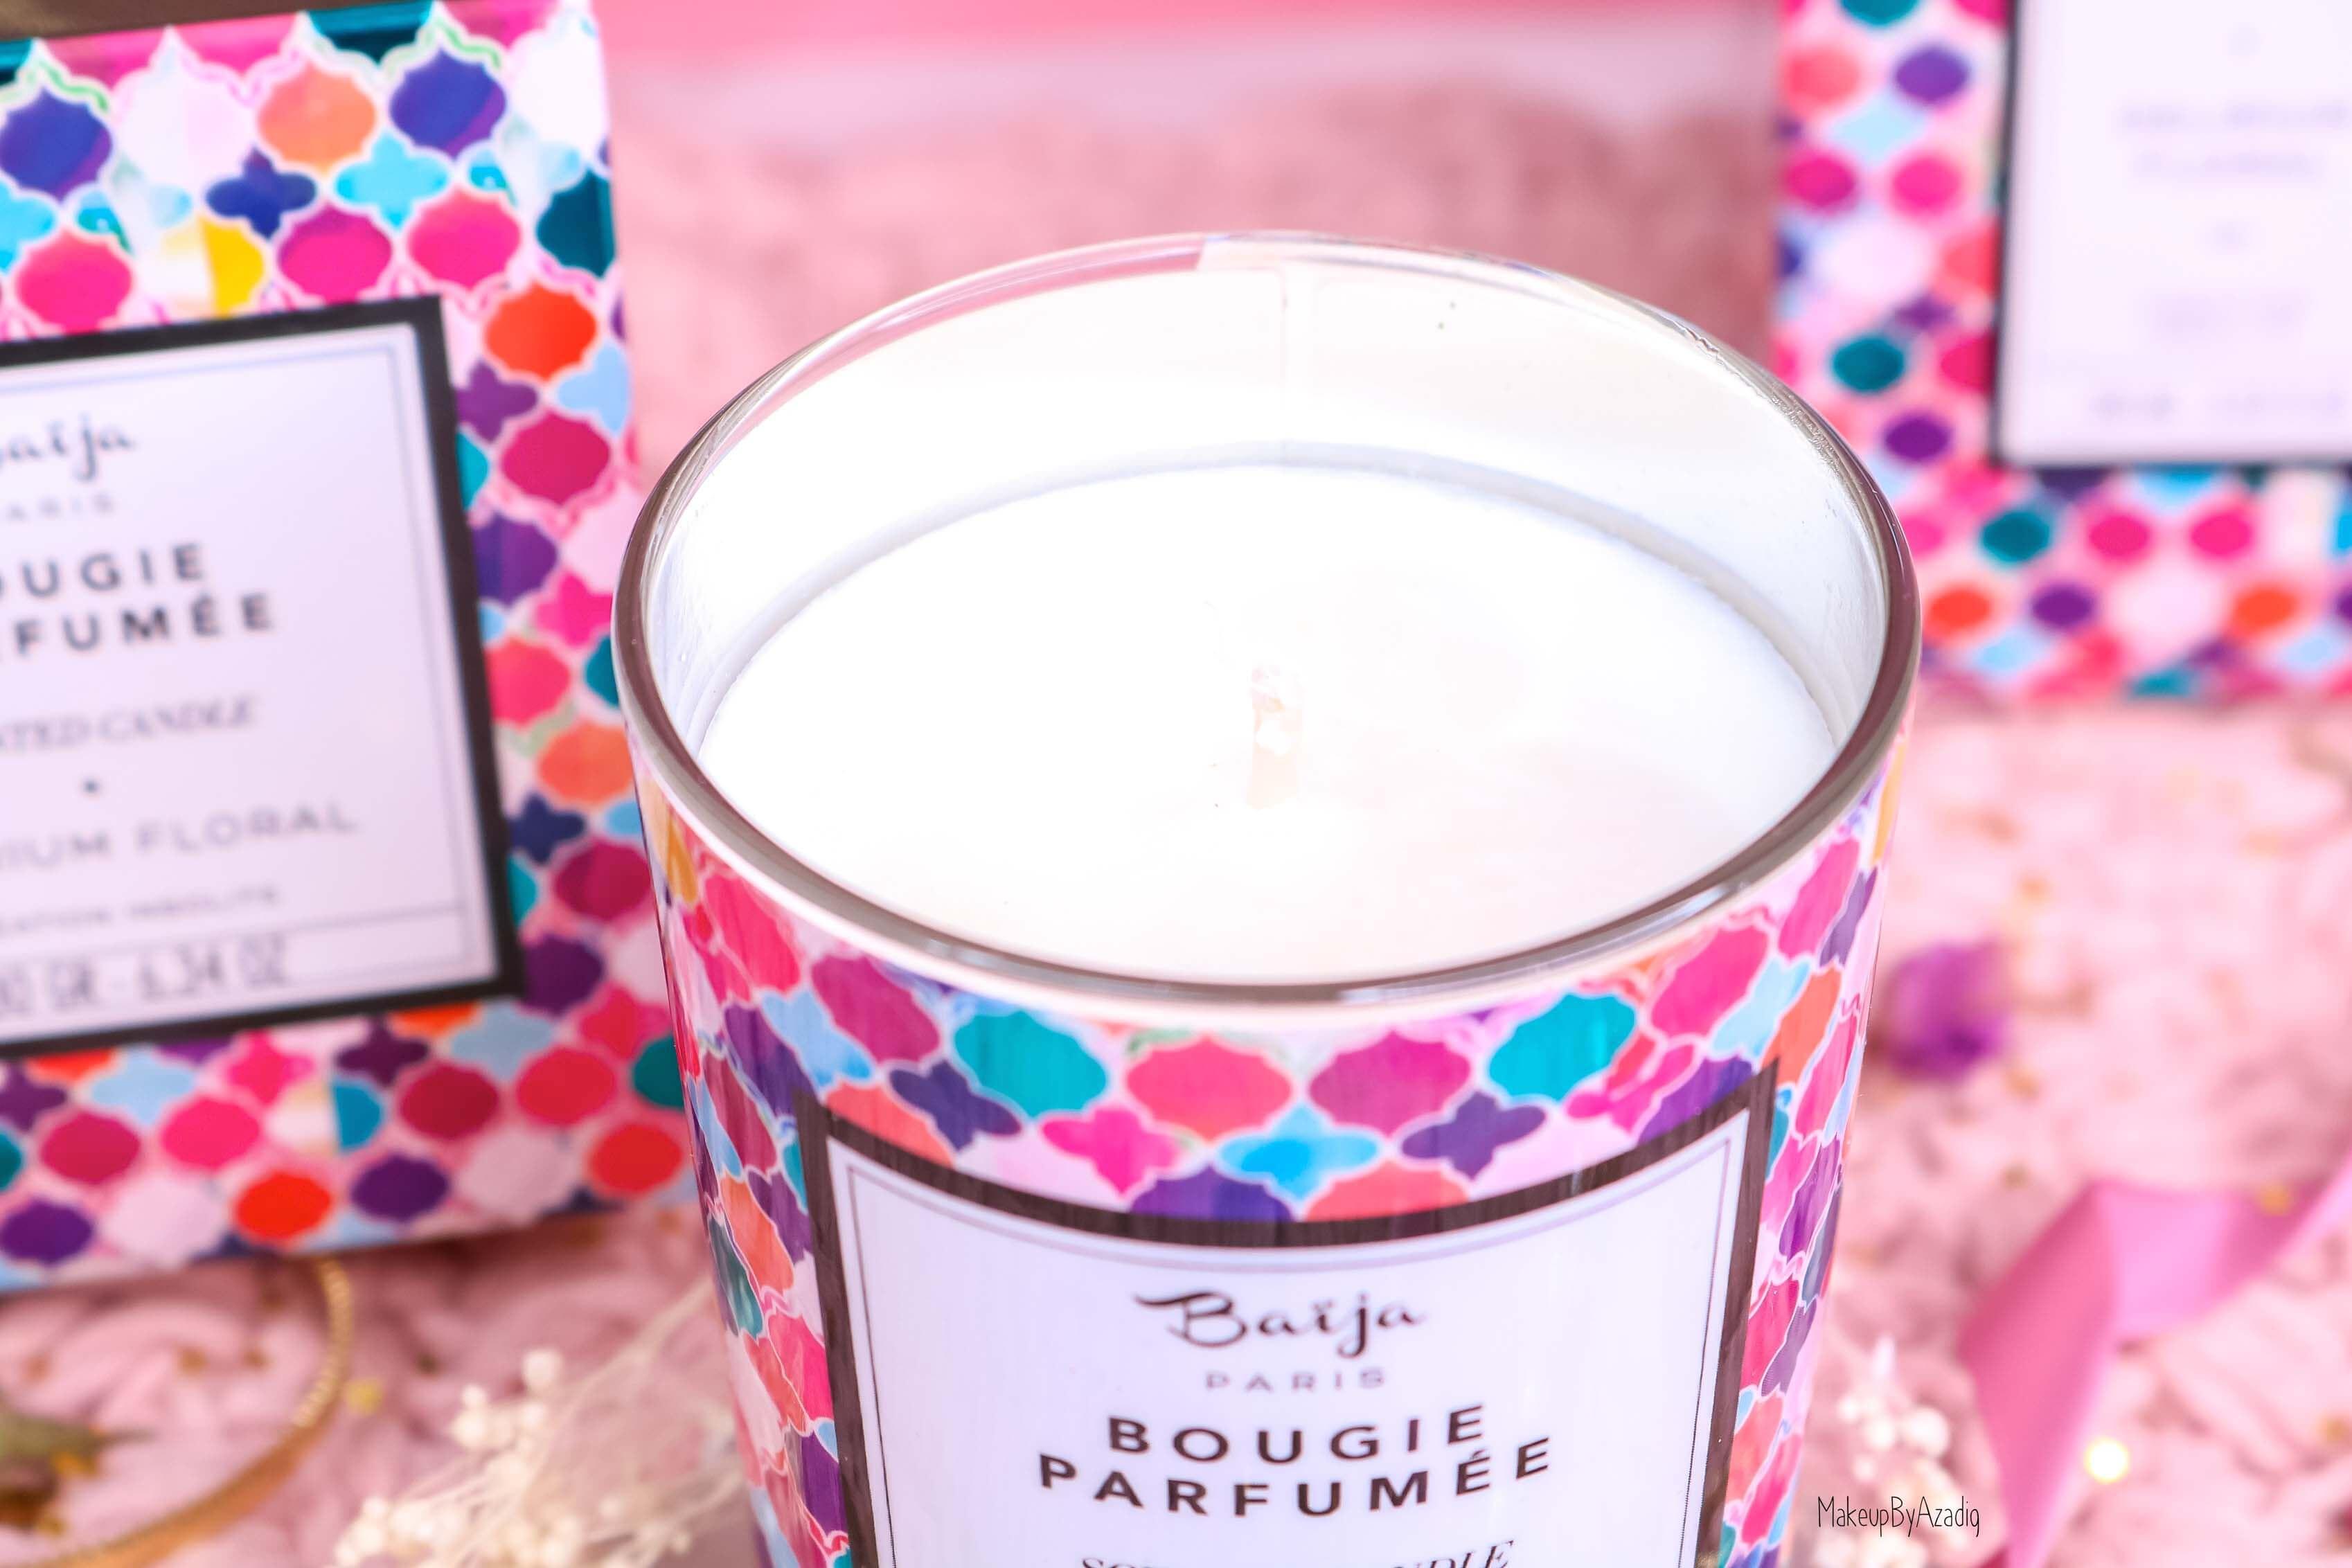 revue-collection-delirium-floral-baija-paris-corps-bougie-gommage-soin-fleurs-makeupbyazadig-avis-prix-sephora-cire